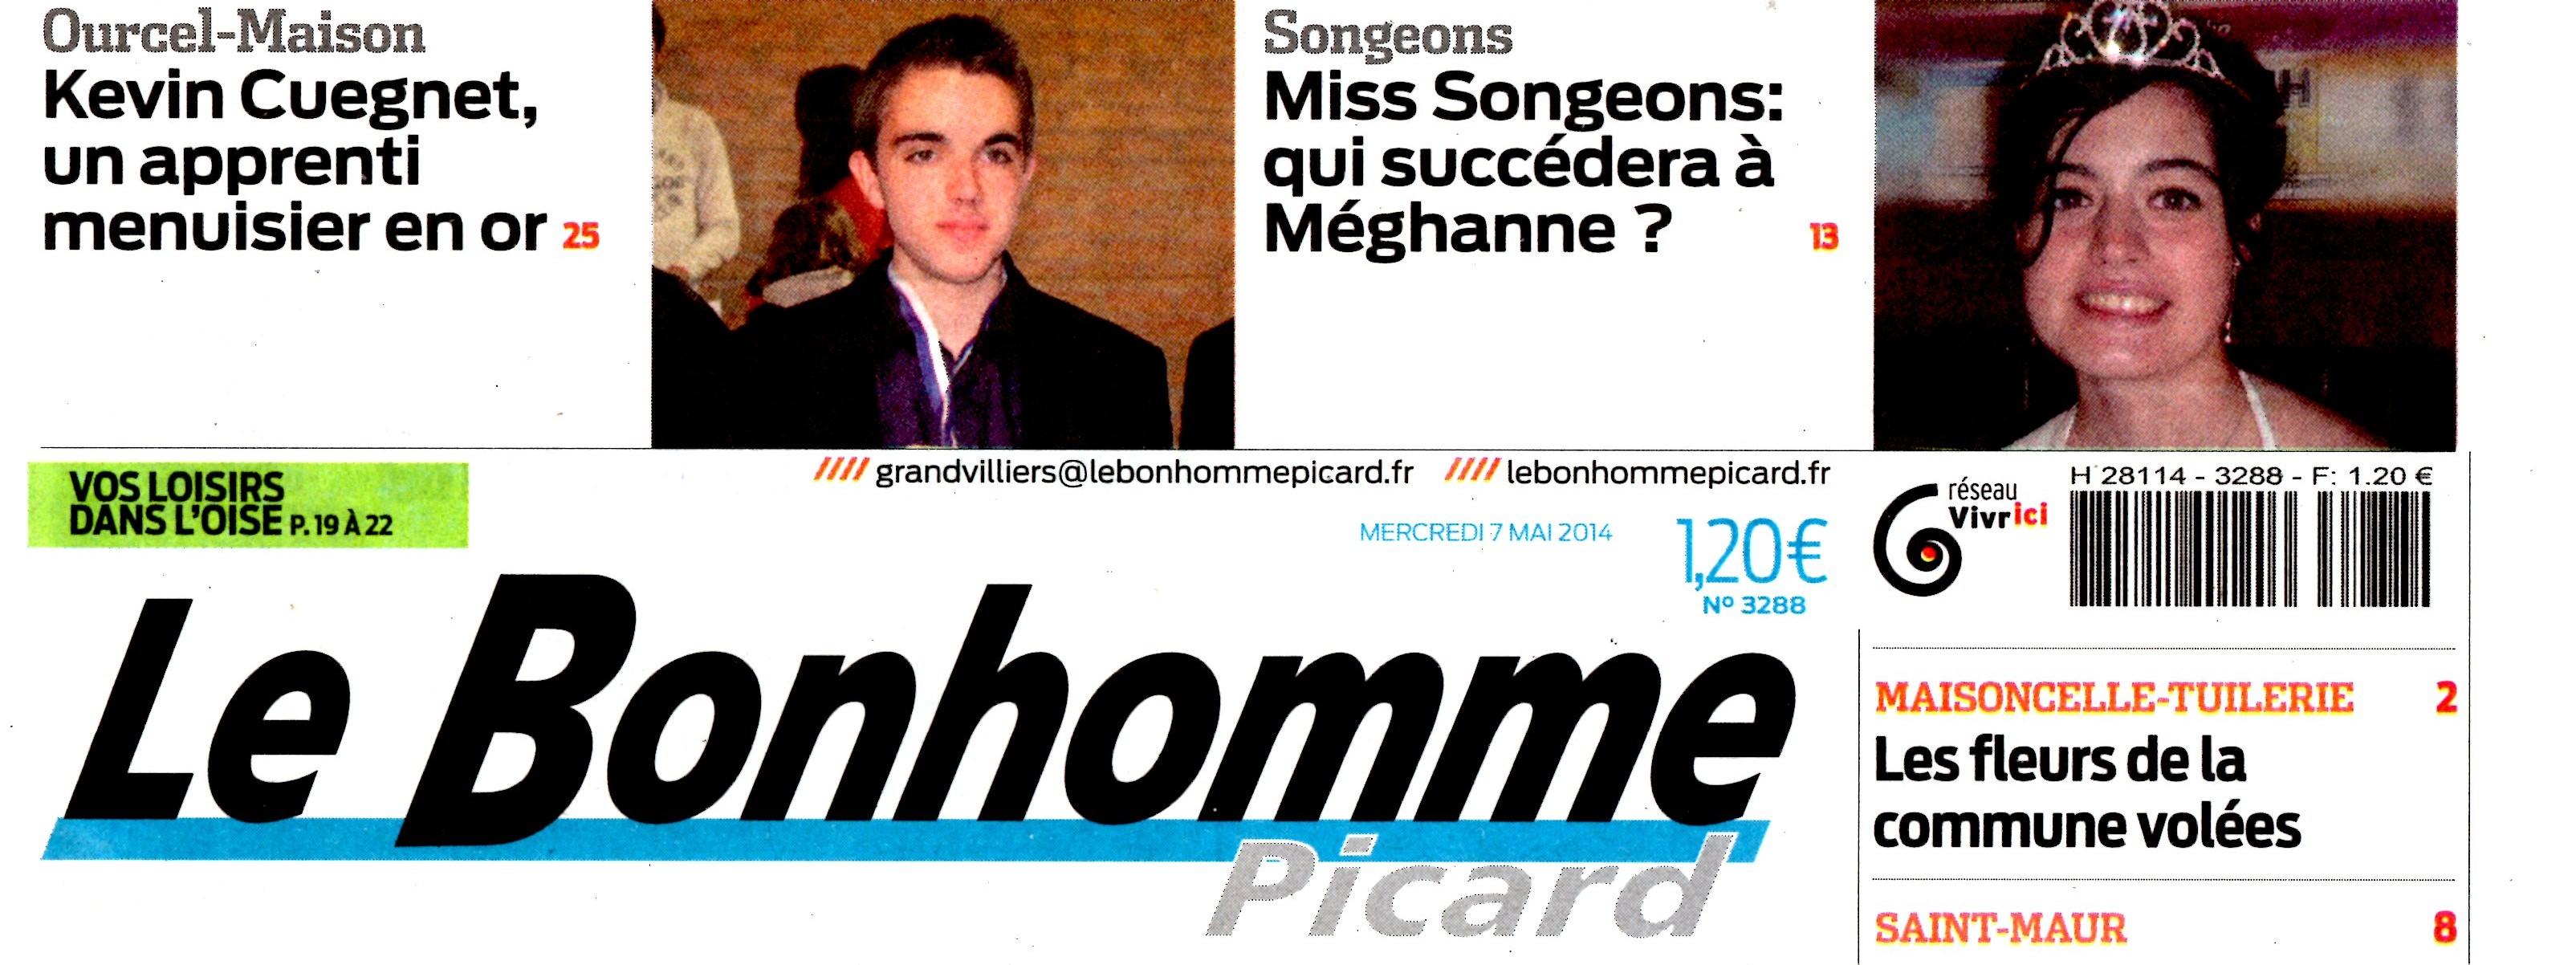 LE BONHOMME PICARD 7 MAI 2014